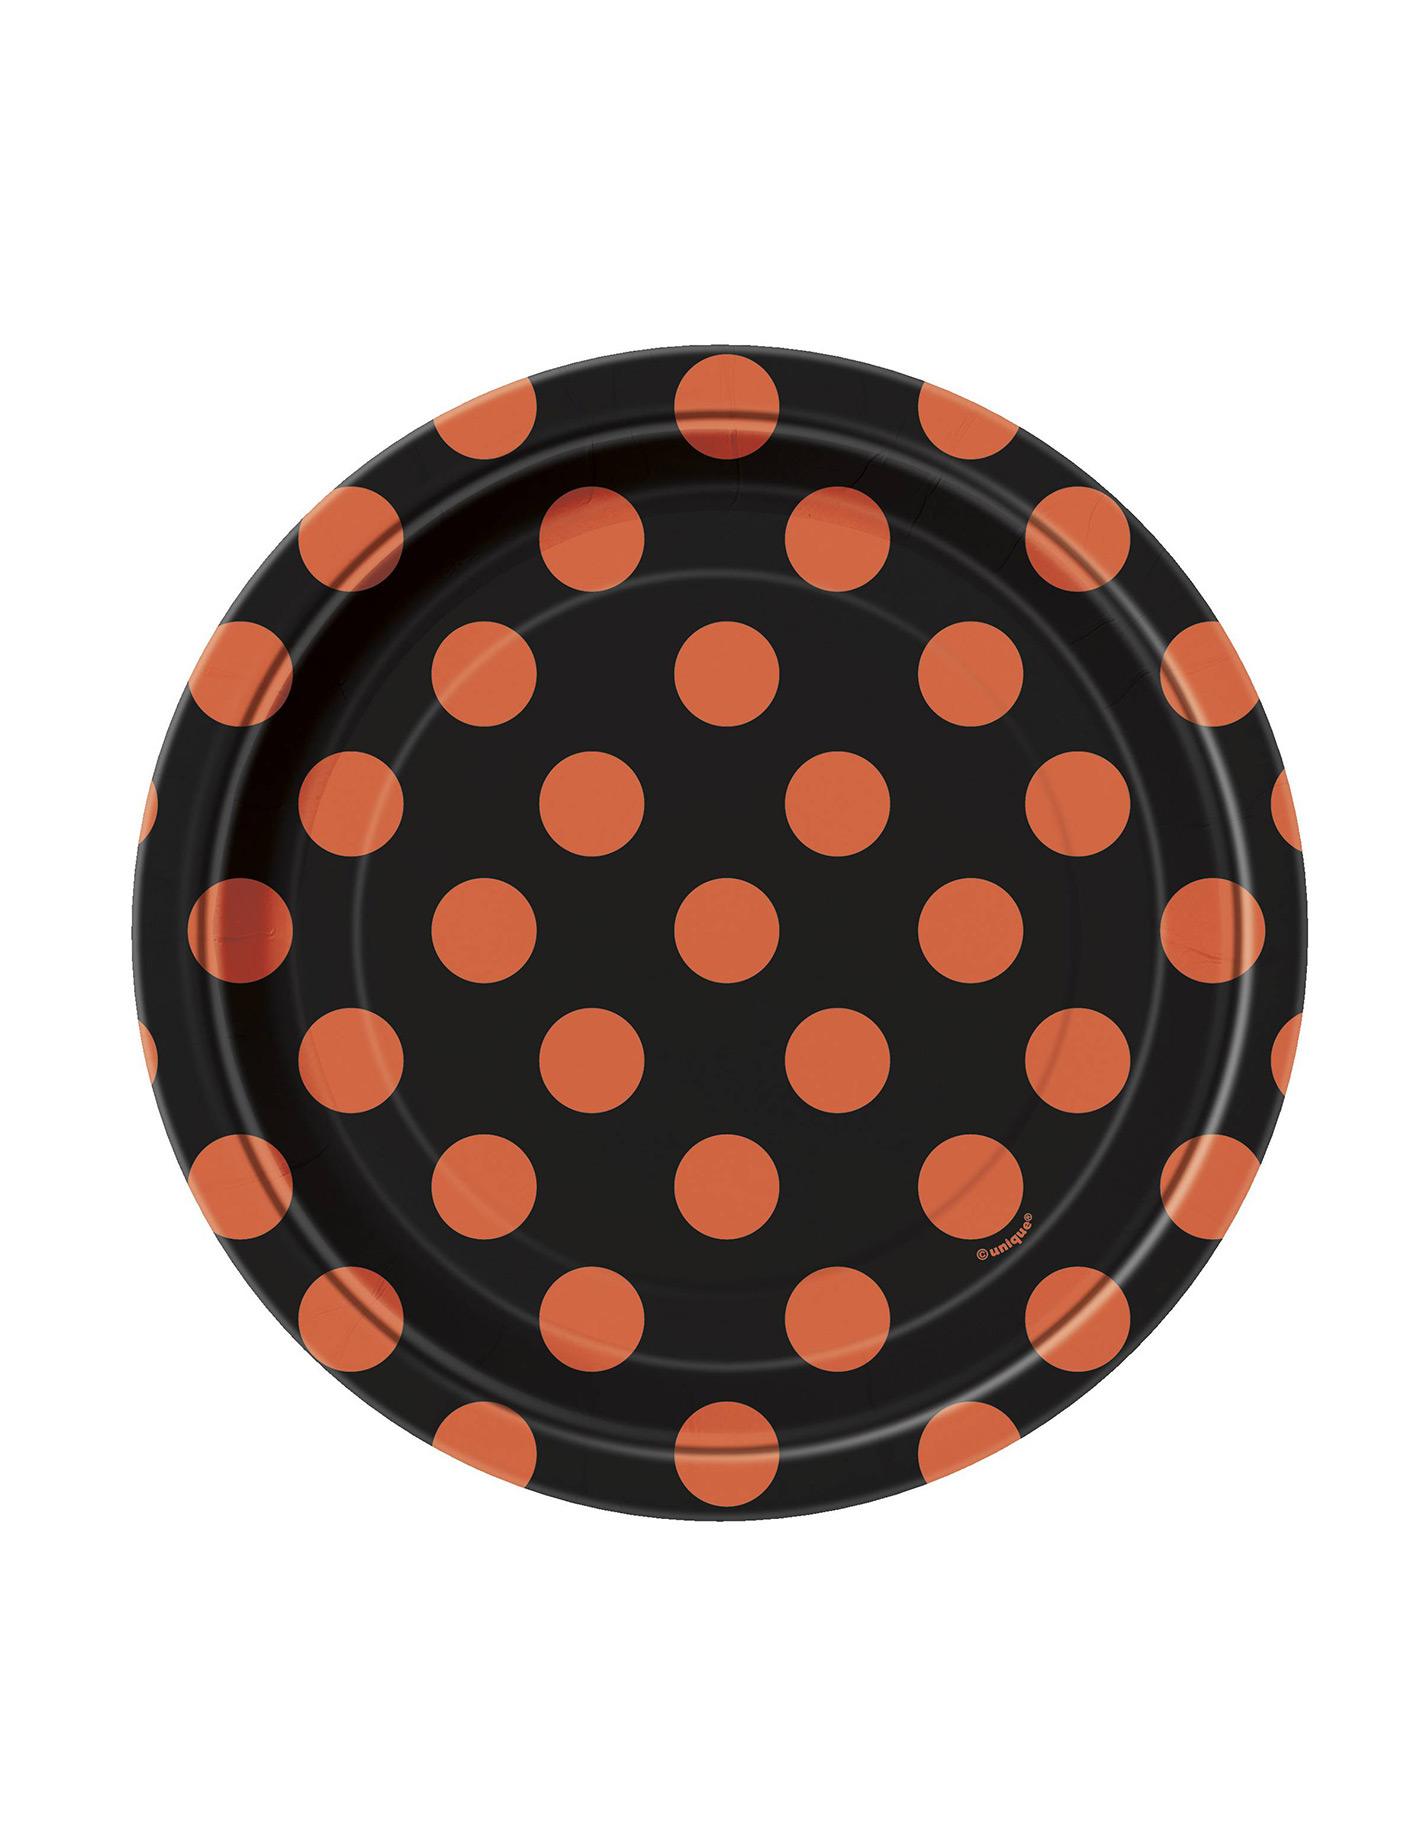 gepunktete teller halloween pappteller set 8 st ck schwarz orange 17cm g nstige faschings. Black Bedroom Furniture Sets. Home Design Ideas